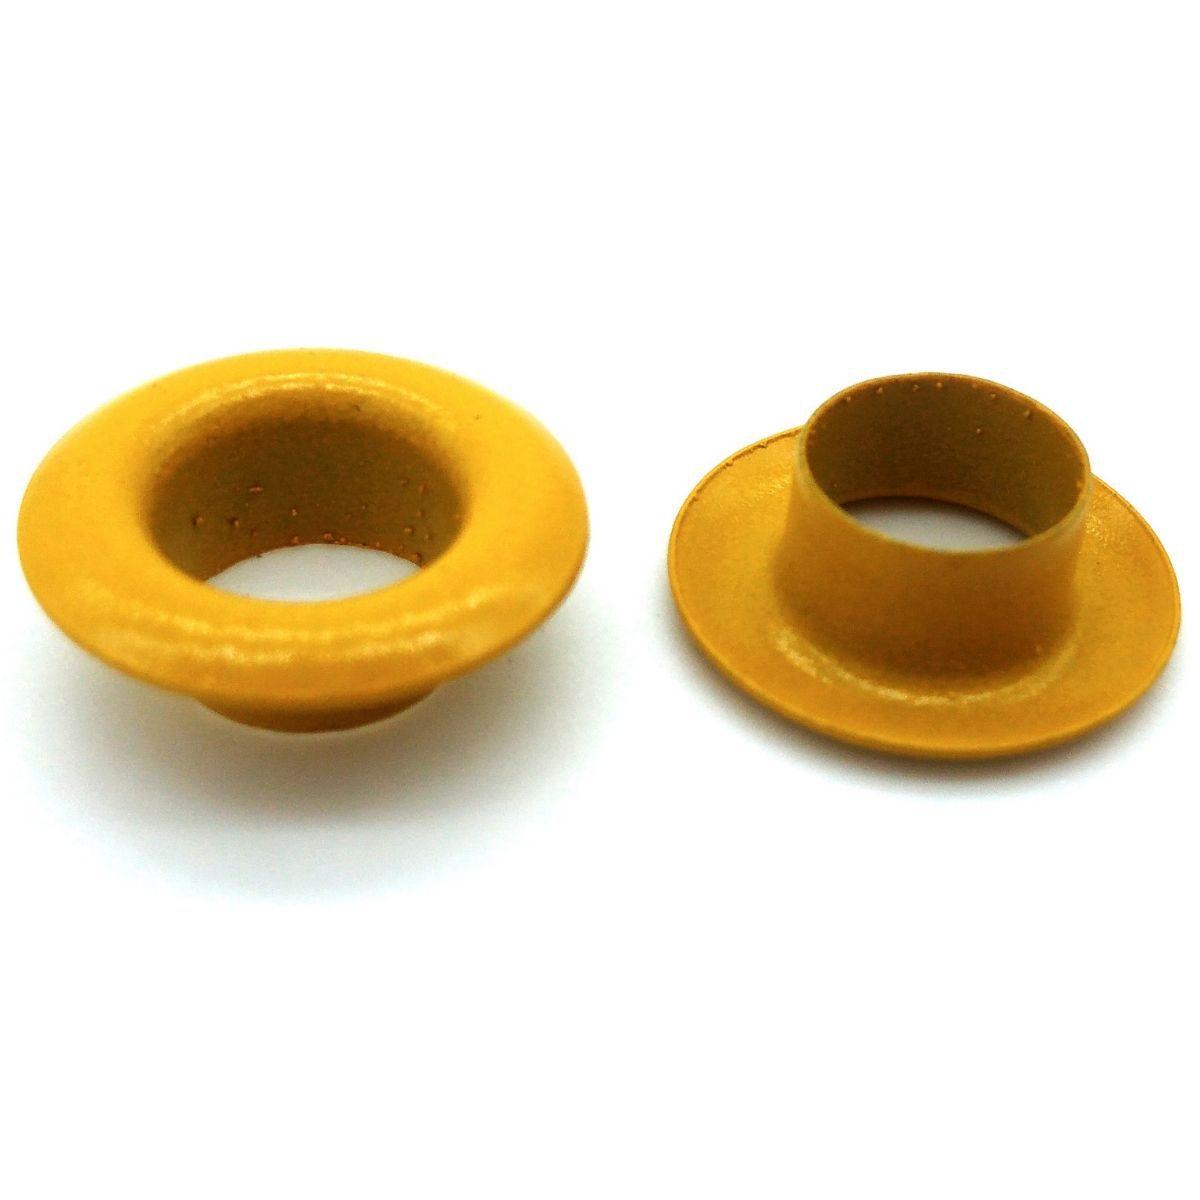 Ilhós Ferro Amarelo Nº 45 15mm de diâmetro externo